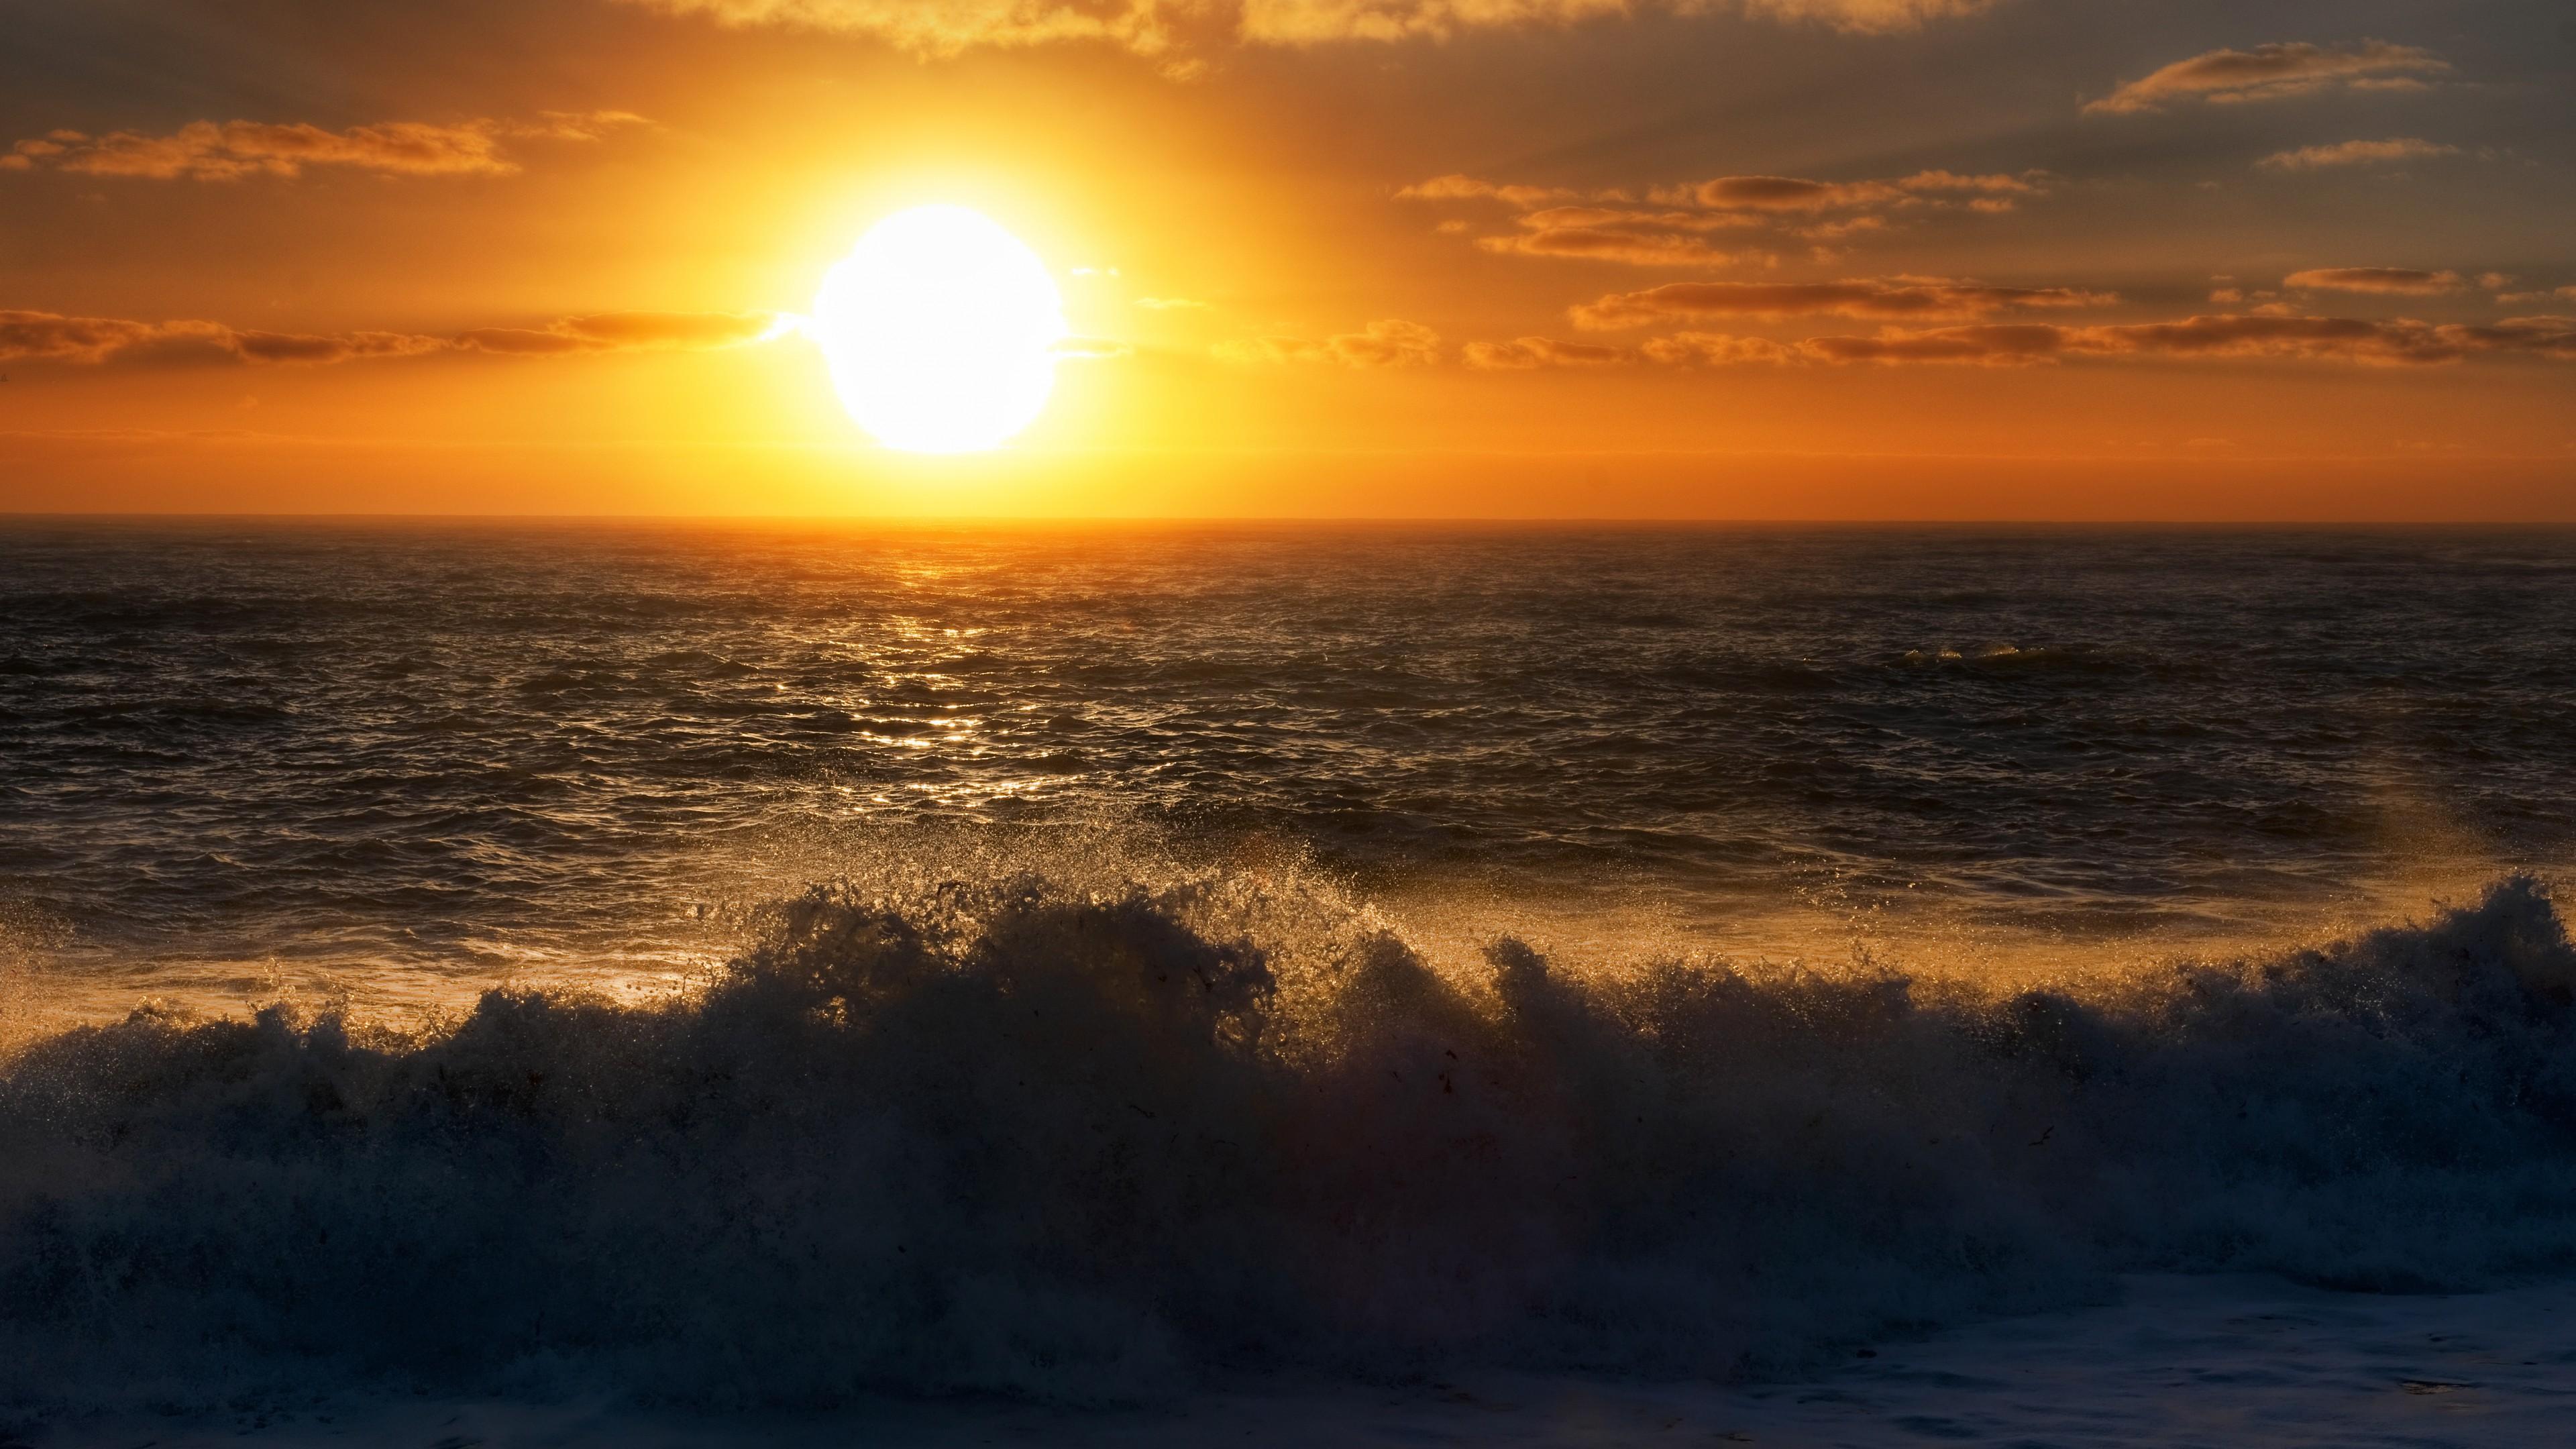 tasman_sea_sunset_beach_waves_4k